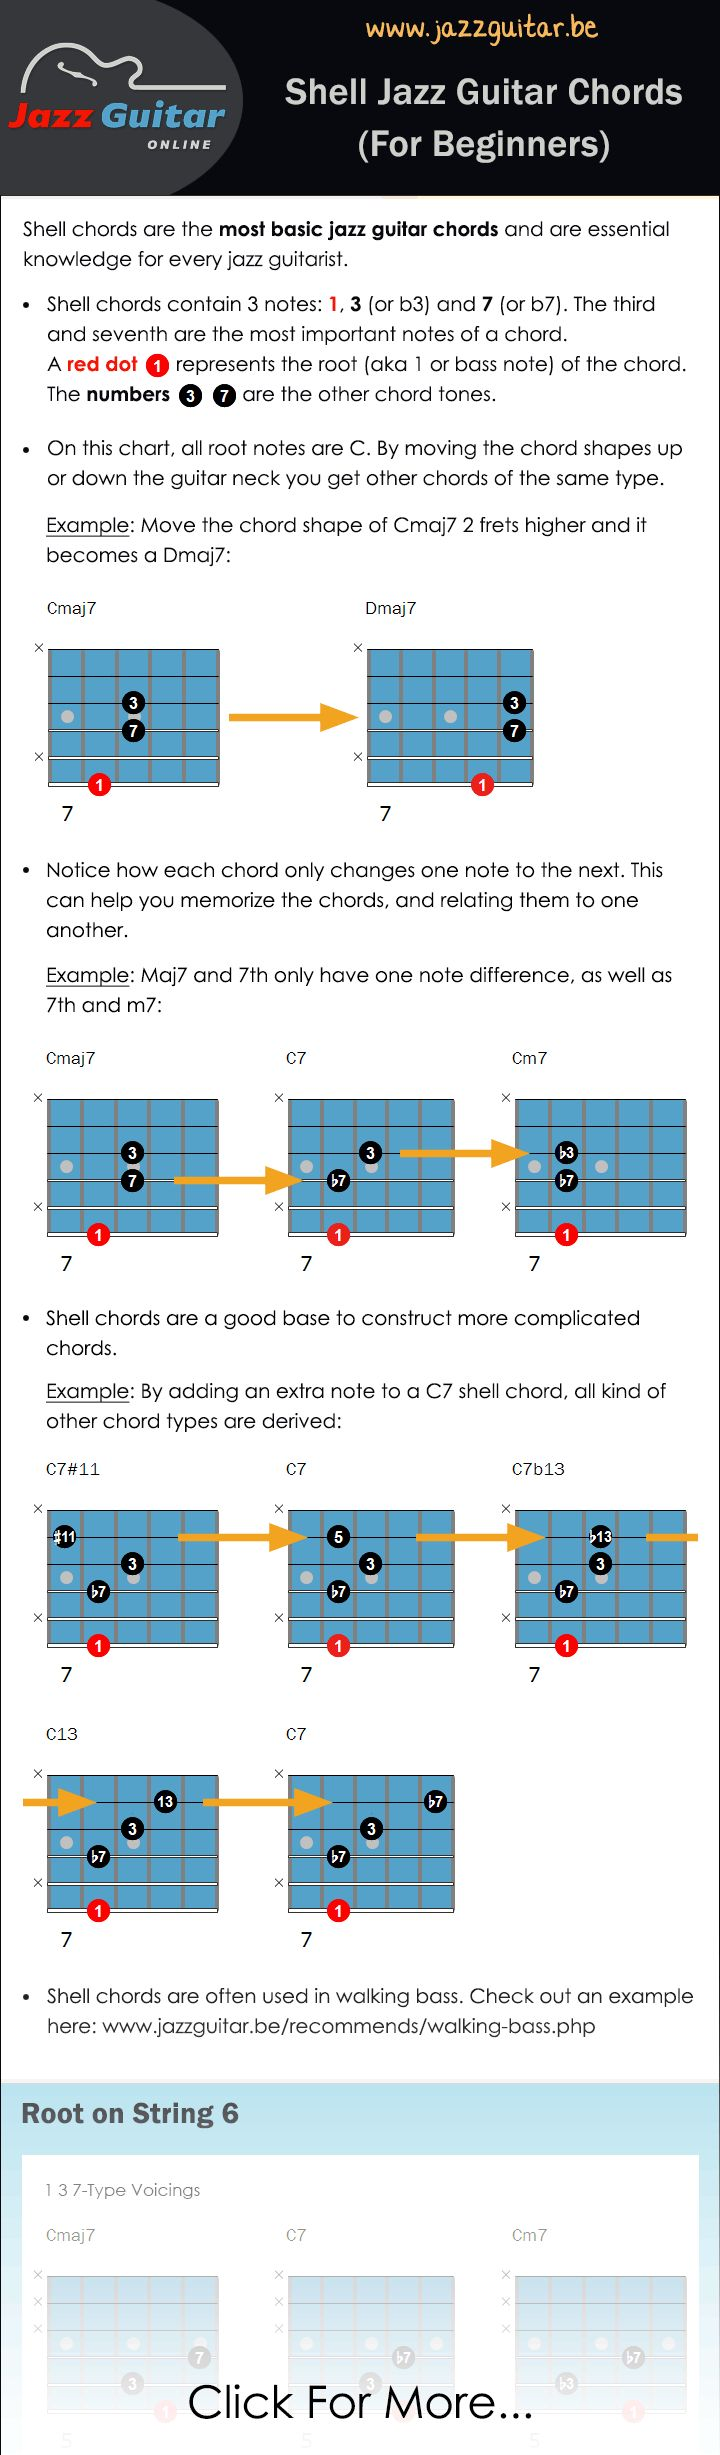 best 25 guitar chords ideas on pinterest learn guitar scales play guitar chords and guitar. Black Bedroom Furniture Sets. Home Design Ideas